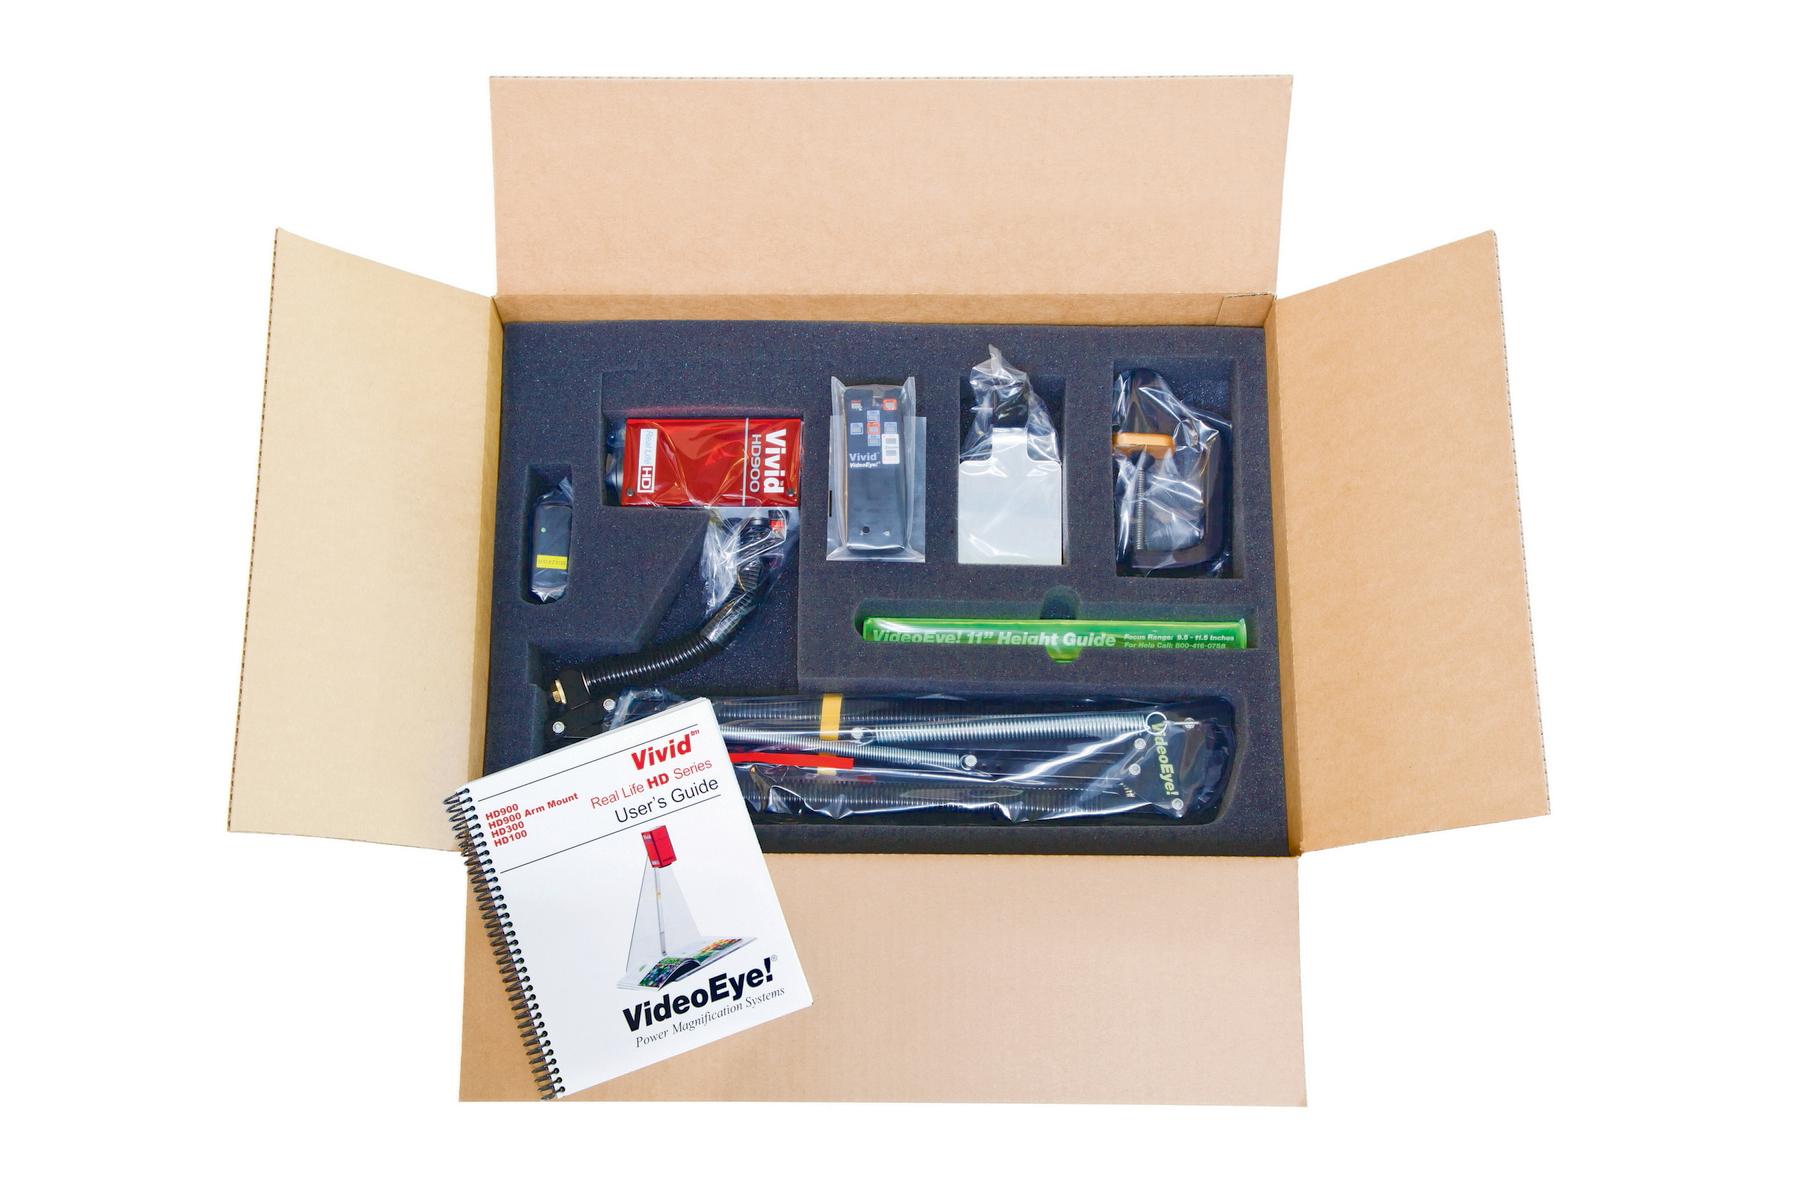 IMG_7215; Box, accessories; RGB.jpg